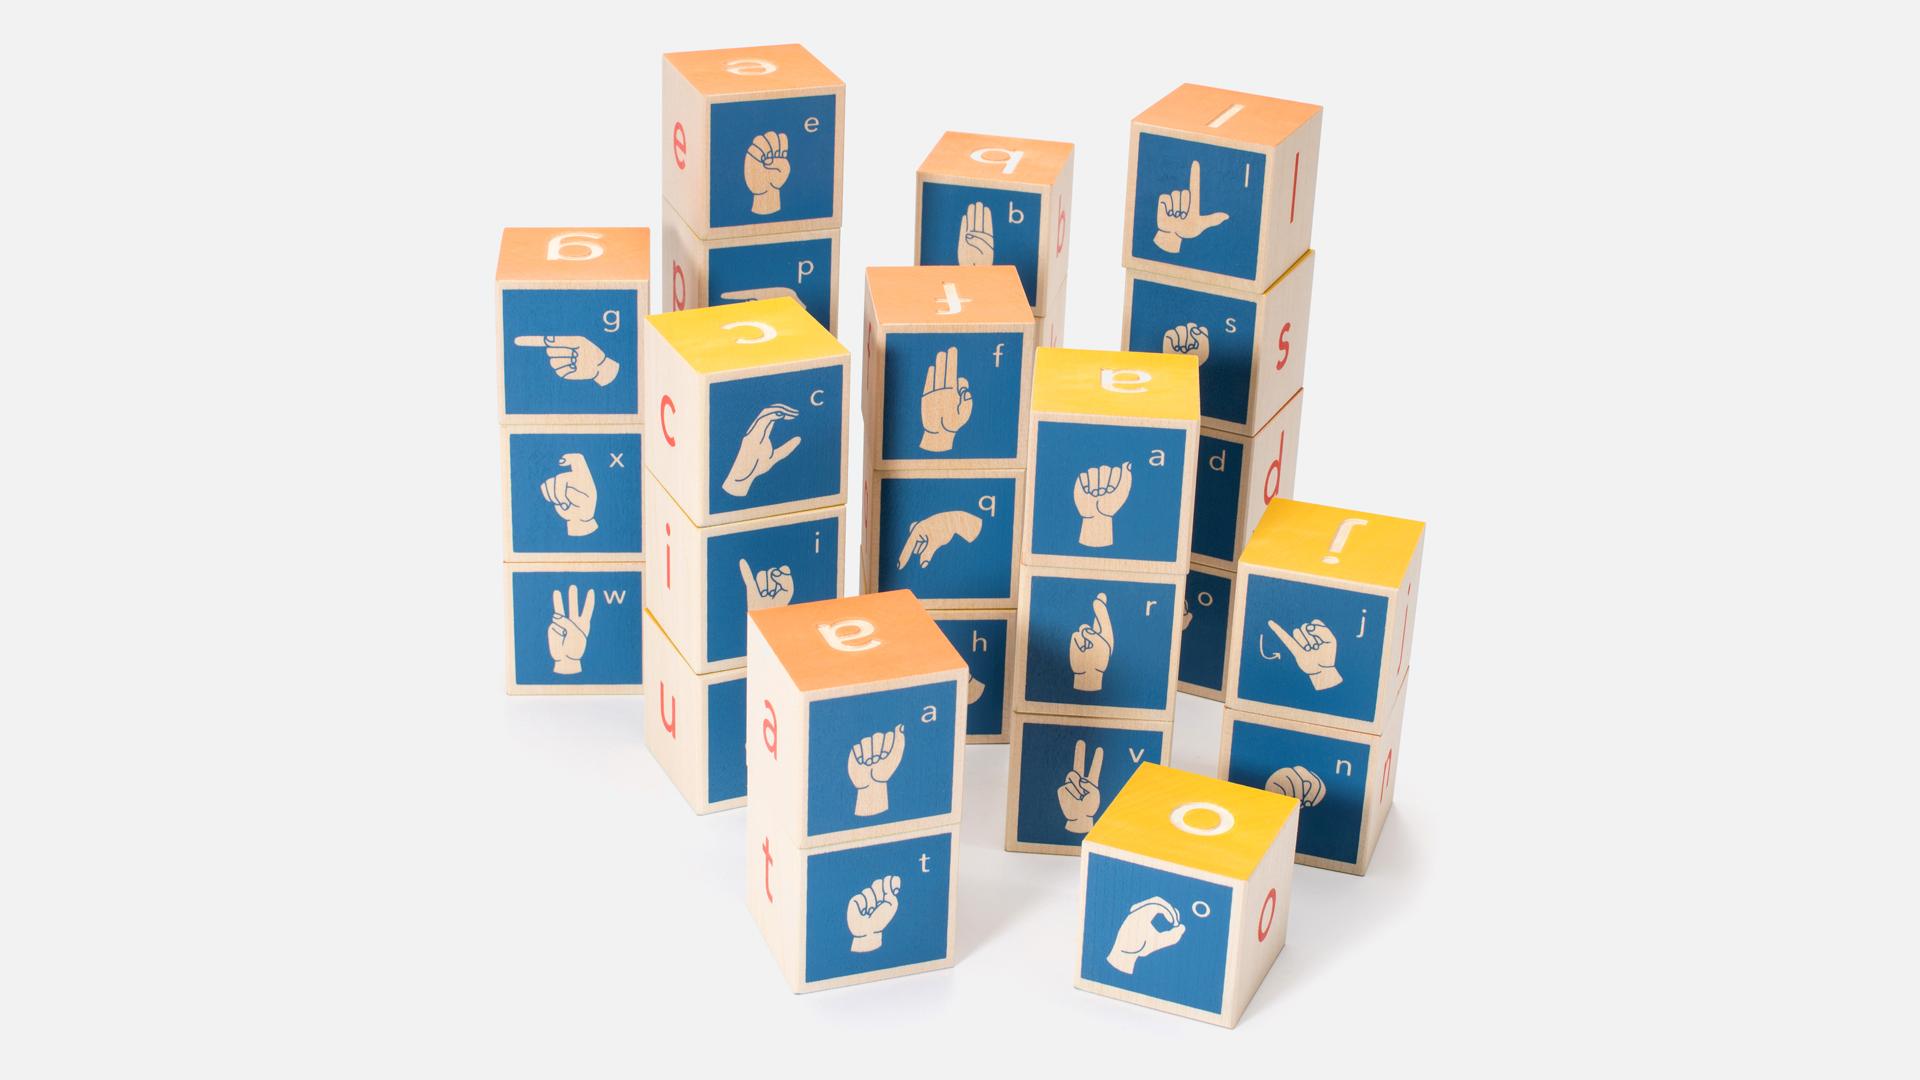 American Sign Language Blocks